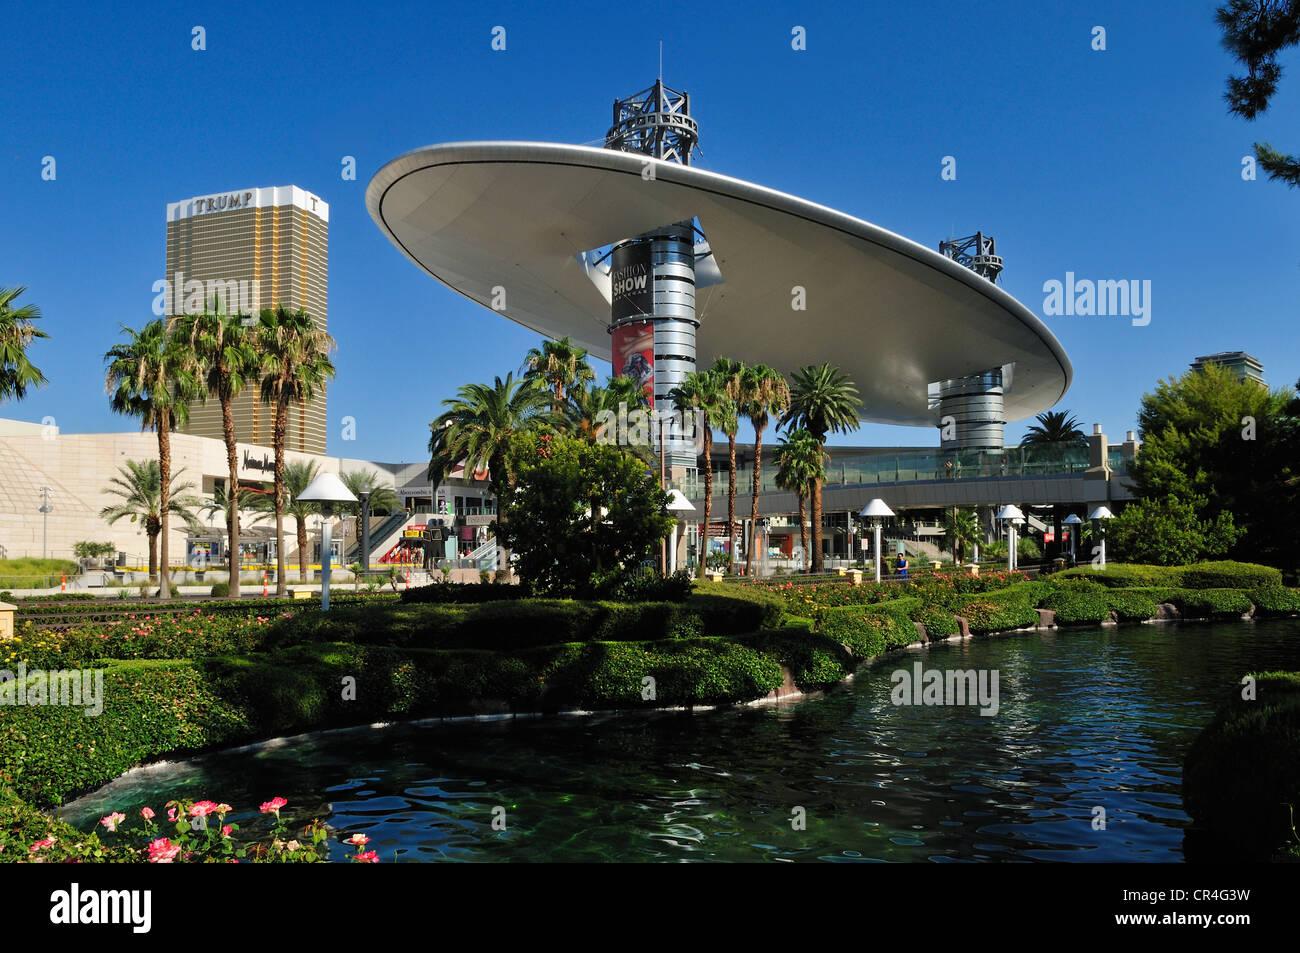 Straßenbild entlang der Strip, Las Vegas, Nevada, USA, Nordamerika Stockbild